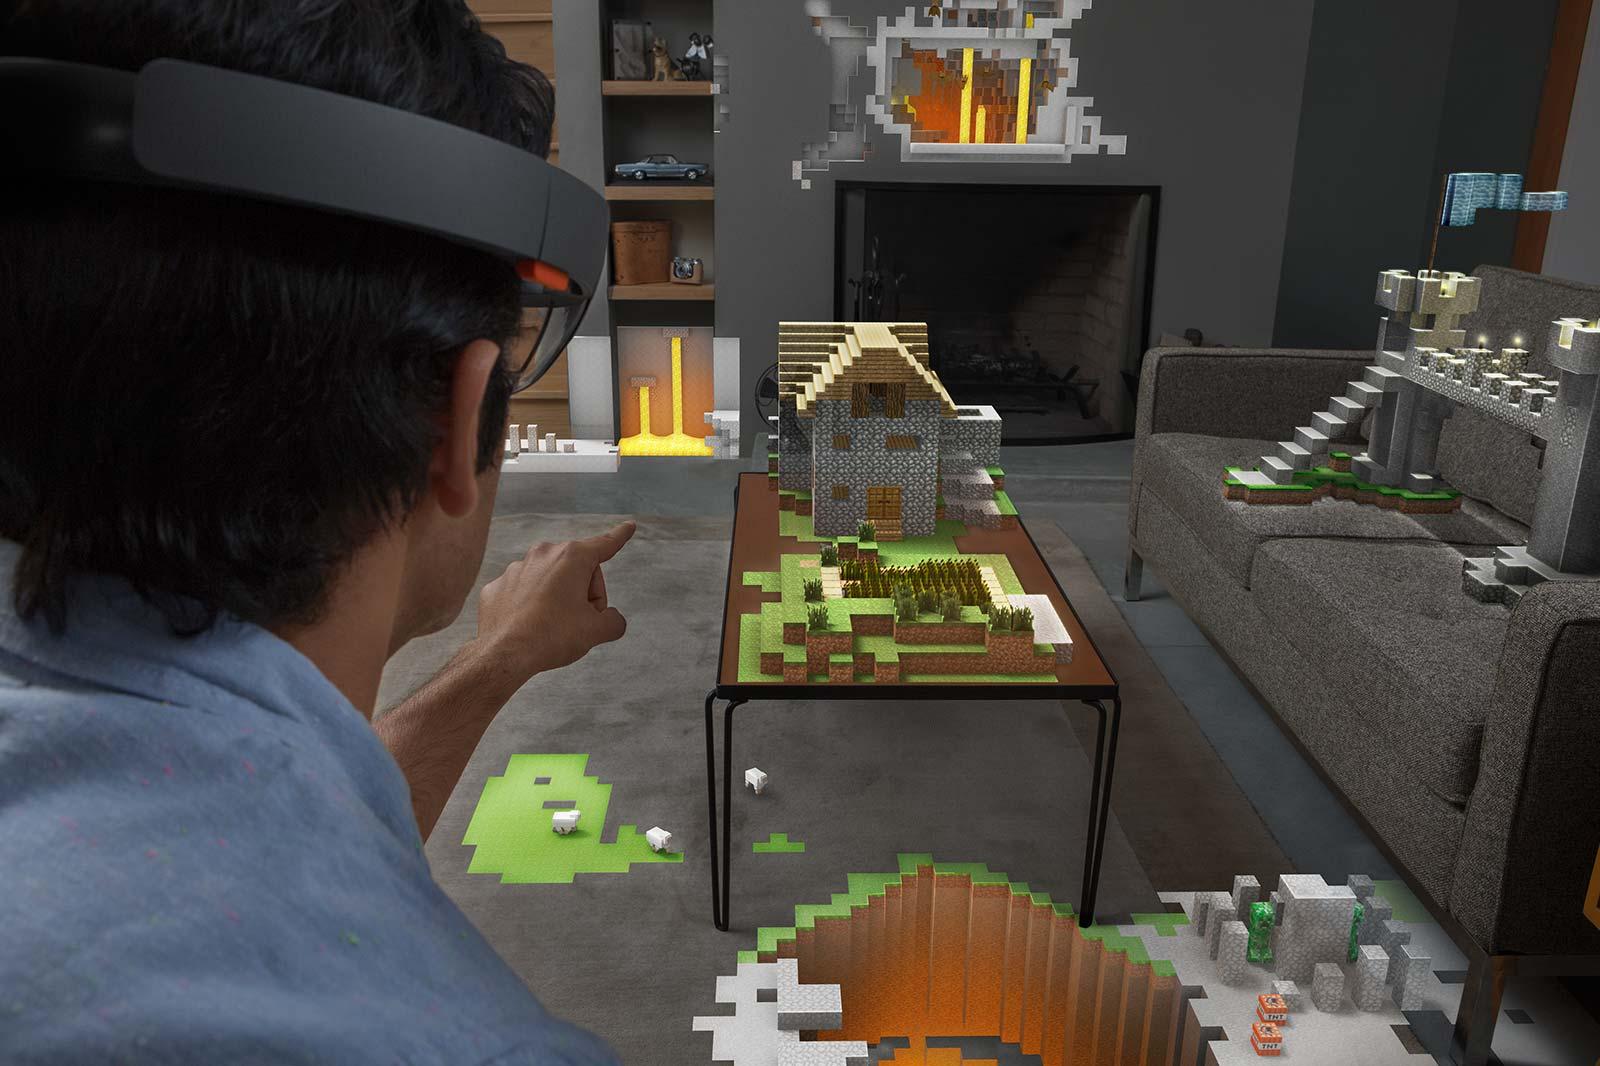 Microsoft HoloLens Projiziert Virtuelle Objekte Ins Wohnzimmer